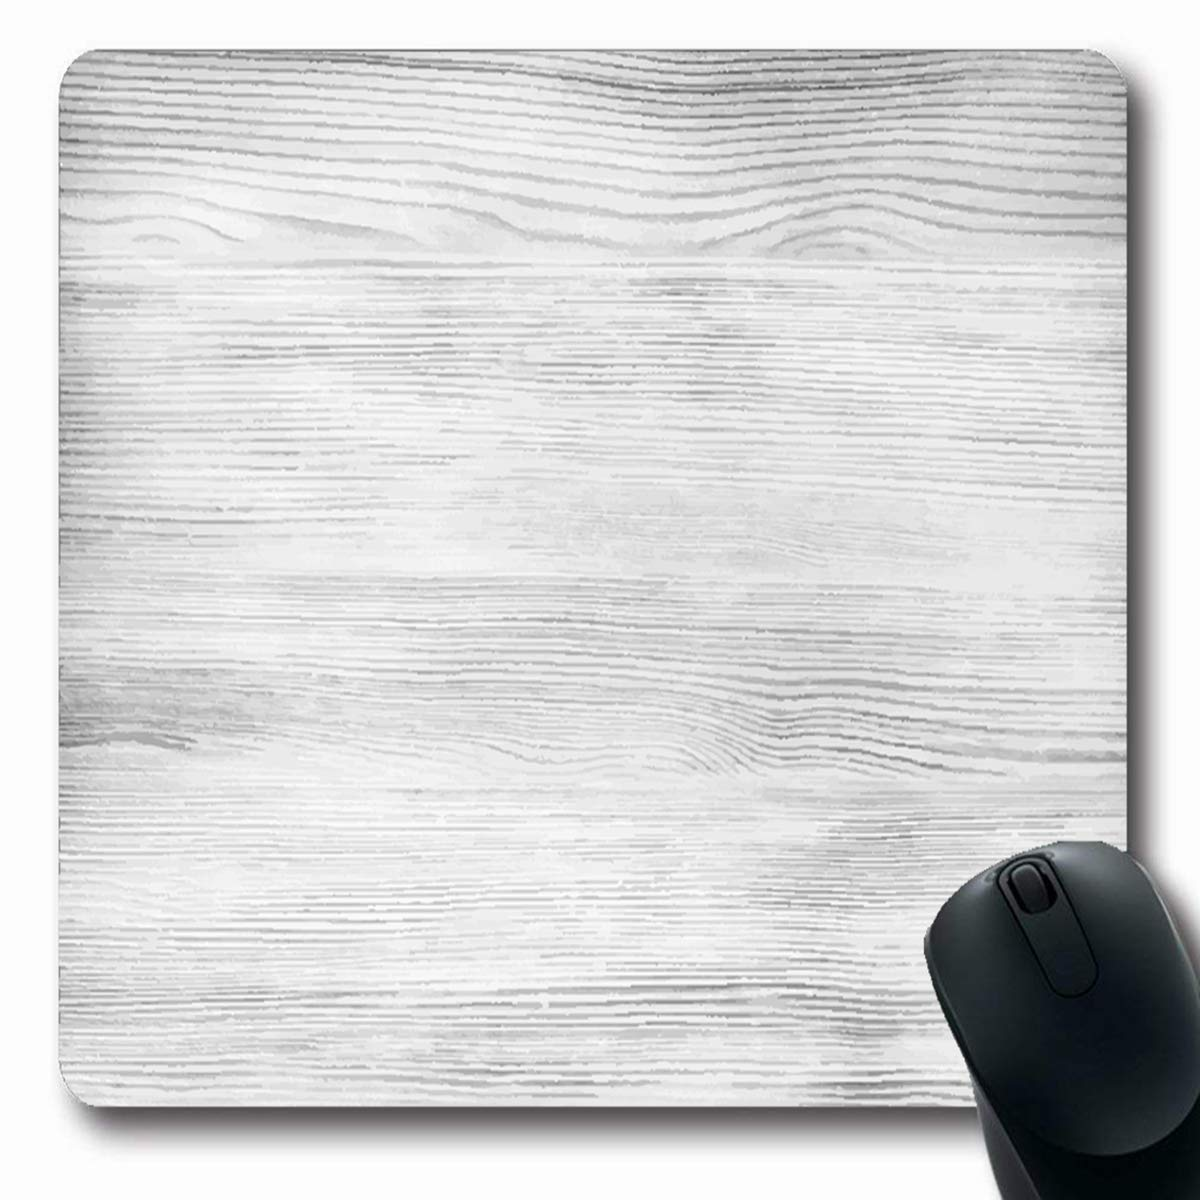 Tobesonne マウスパッド ストライプ ネイビーパターン 抽象 ヴィンテージ表面 インディゴ オールドデニム モダンデザイン ウォッシュ加工 長方形 7.9 x 9.5インチ ノンスリップ ゲーム用マウスパッド ゴム 長方形マット 7.9